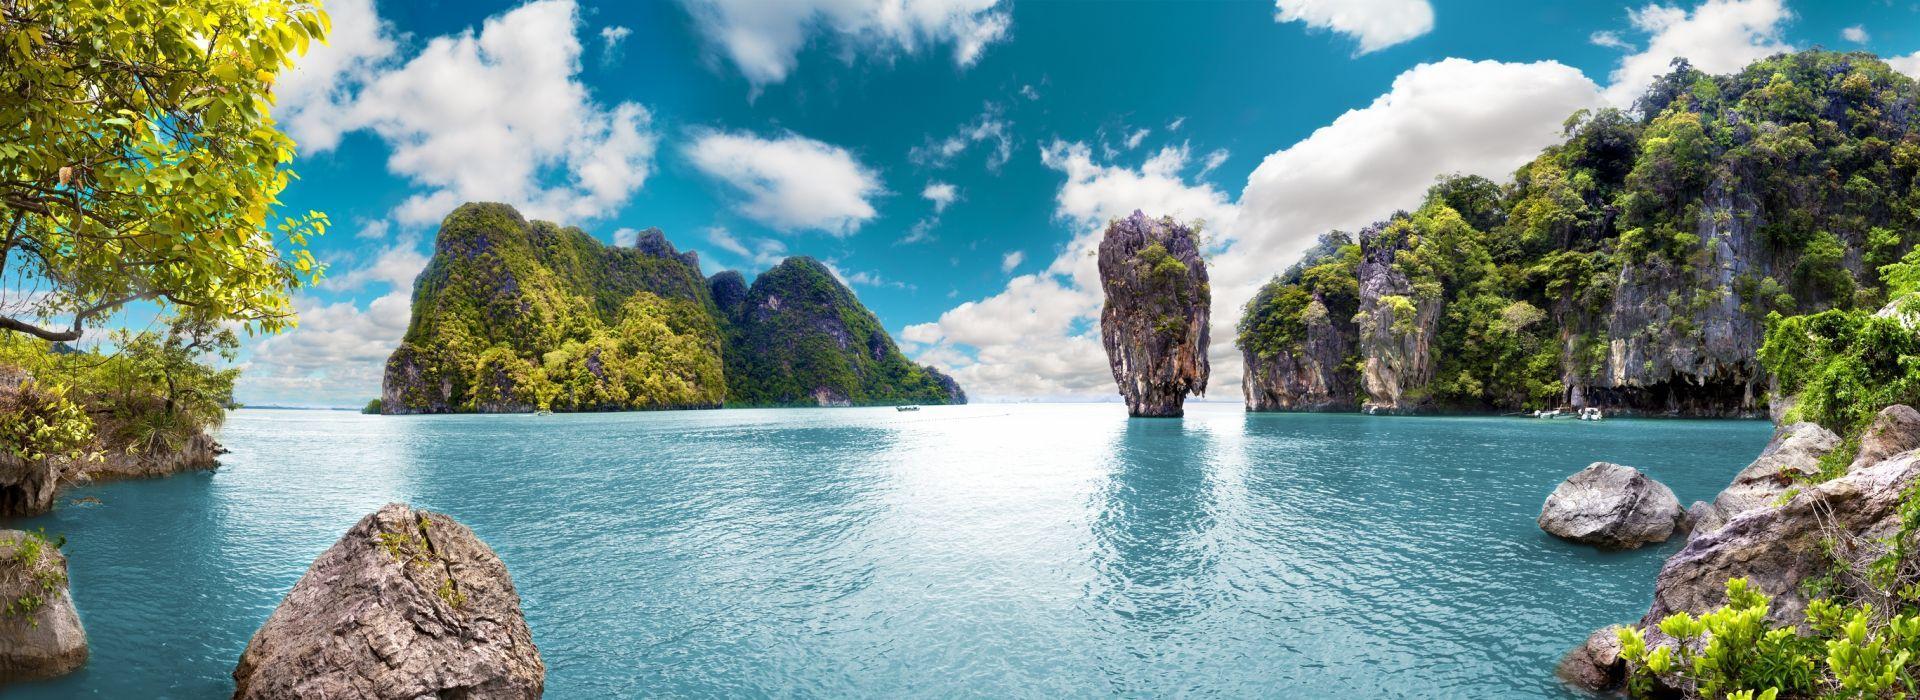 Adventure Tours in Phuket